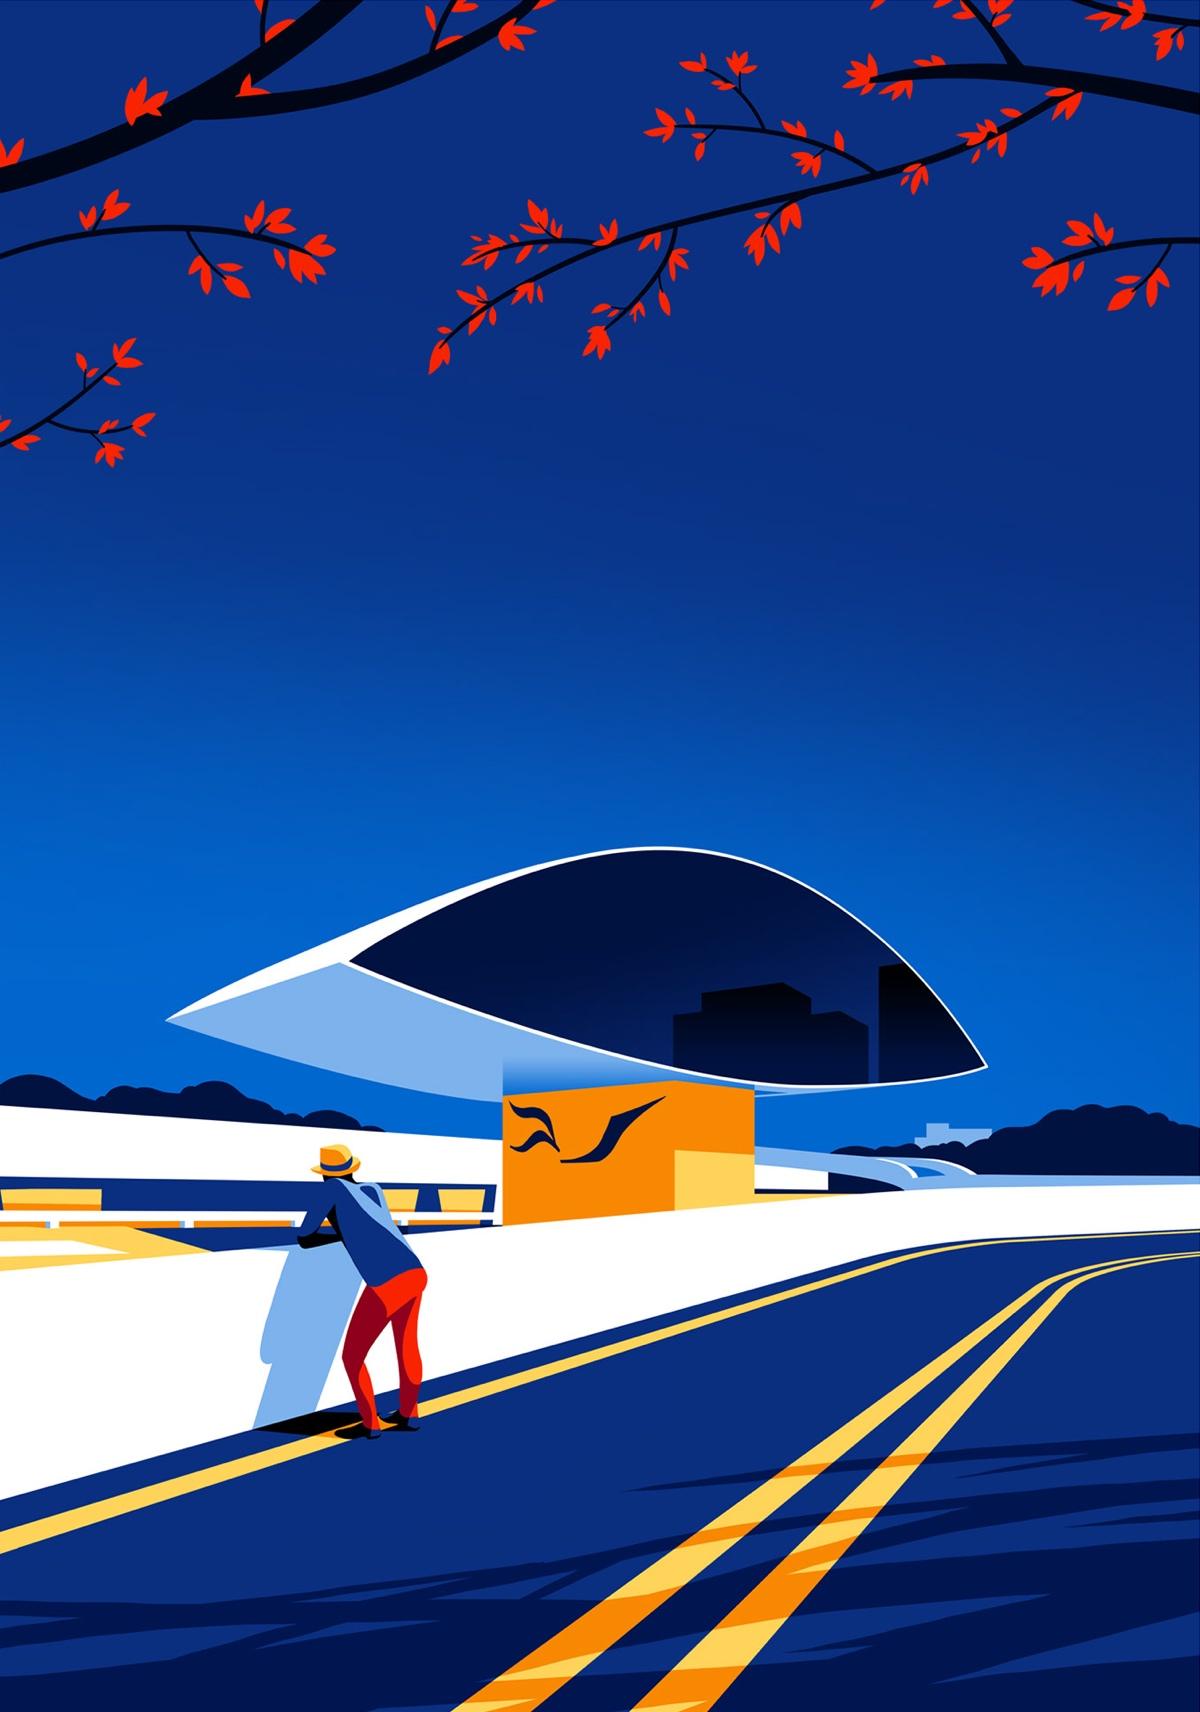 oscar-niemeyer-architecture-illustrations-levente-szabo-3